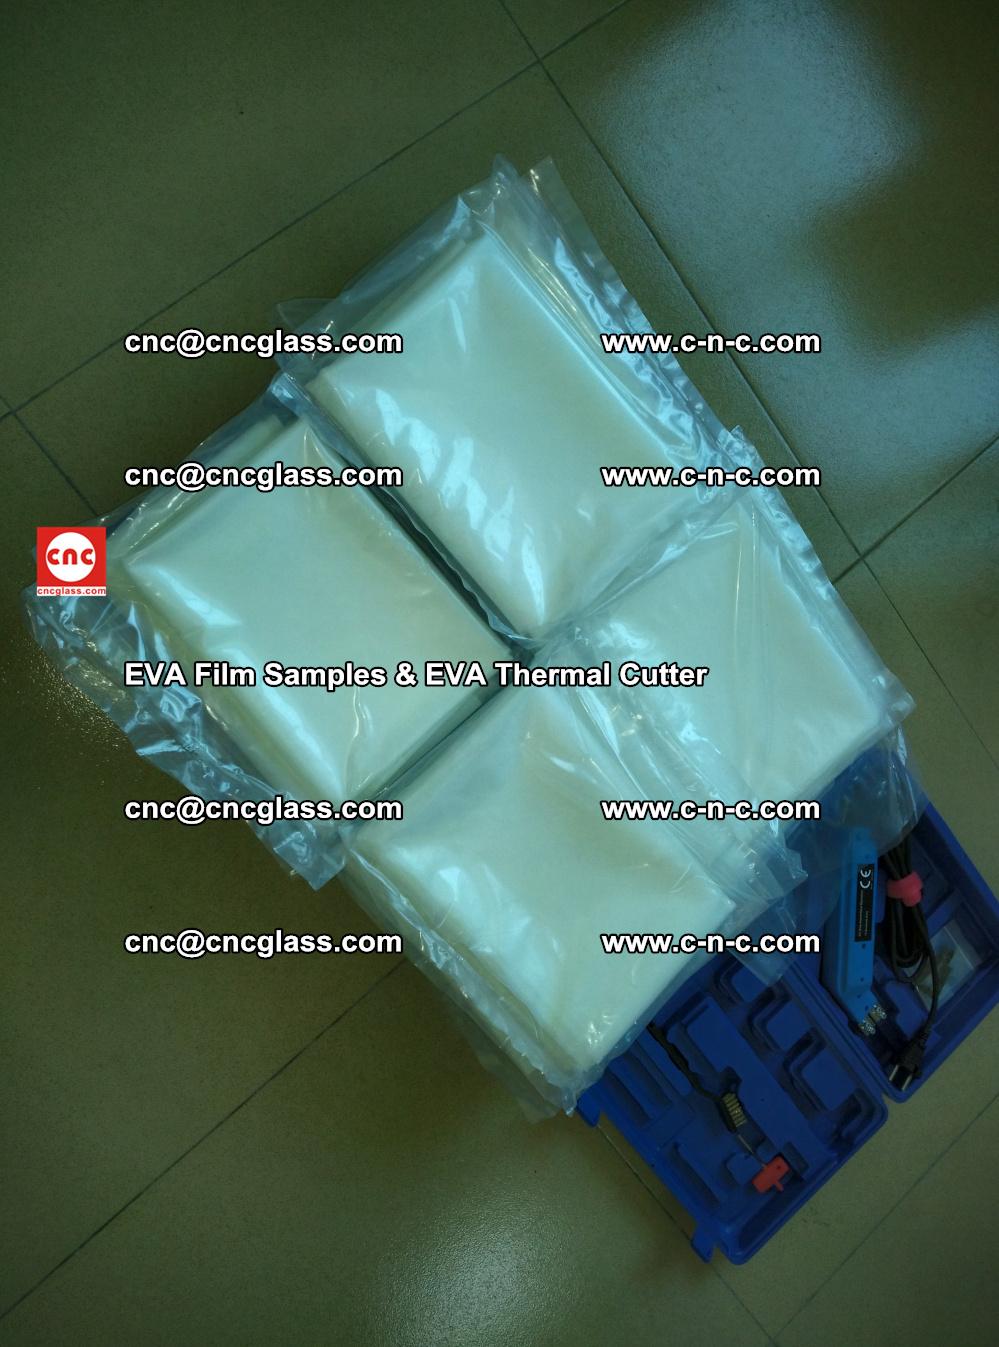 EVAFORCE SUPER CLEAR EVA Film Samples and EVA Thermal Cutter (40)